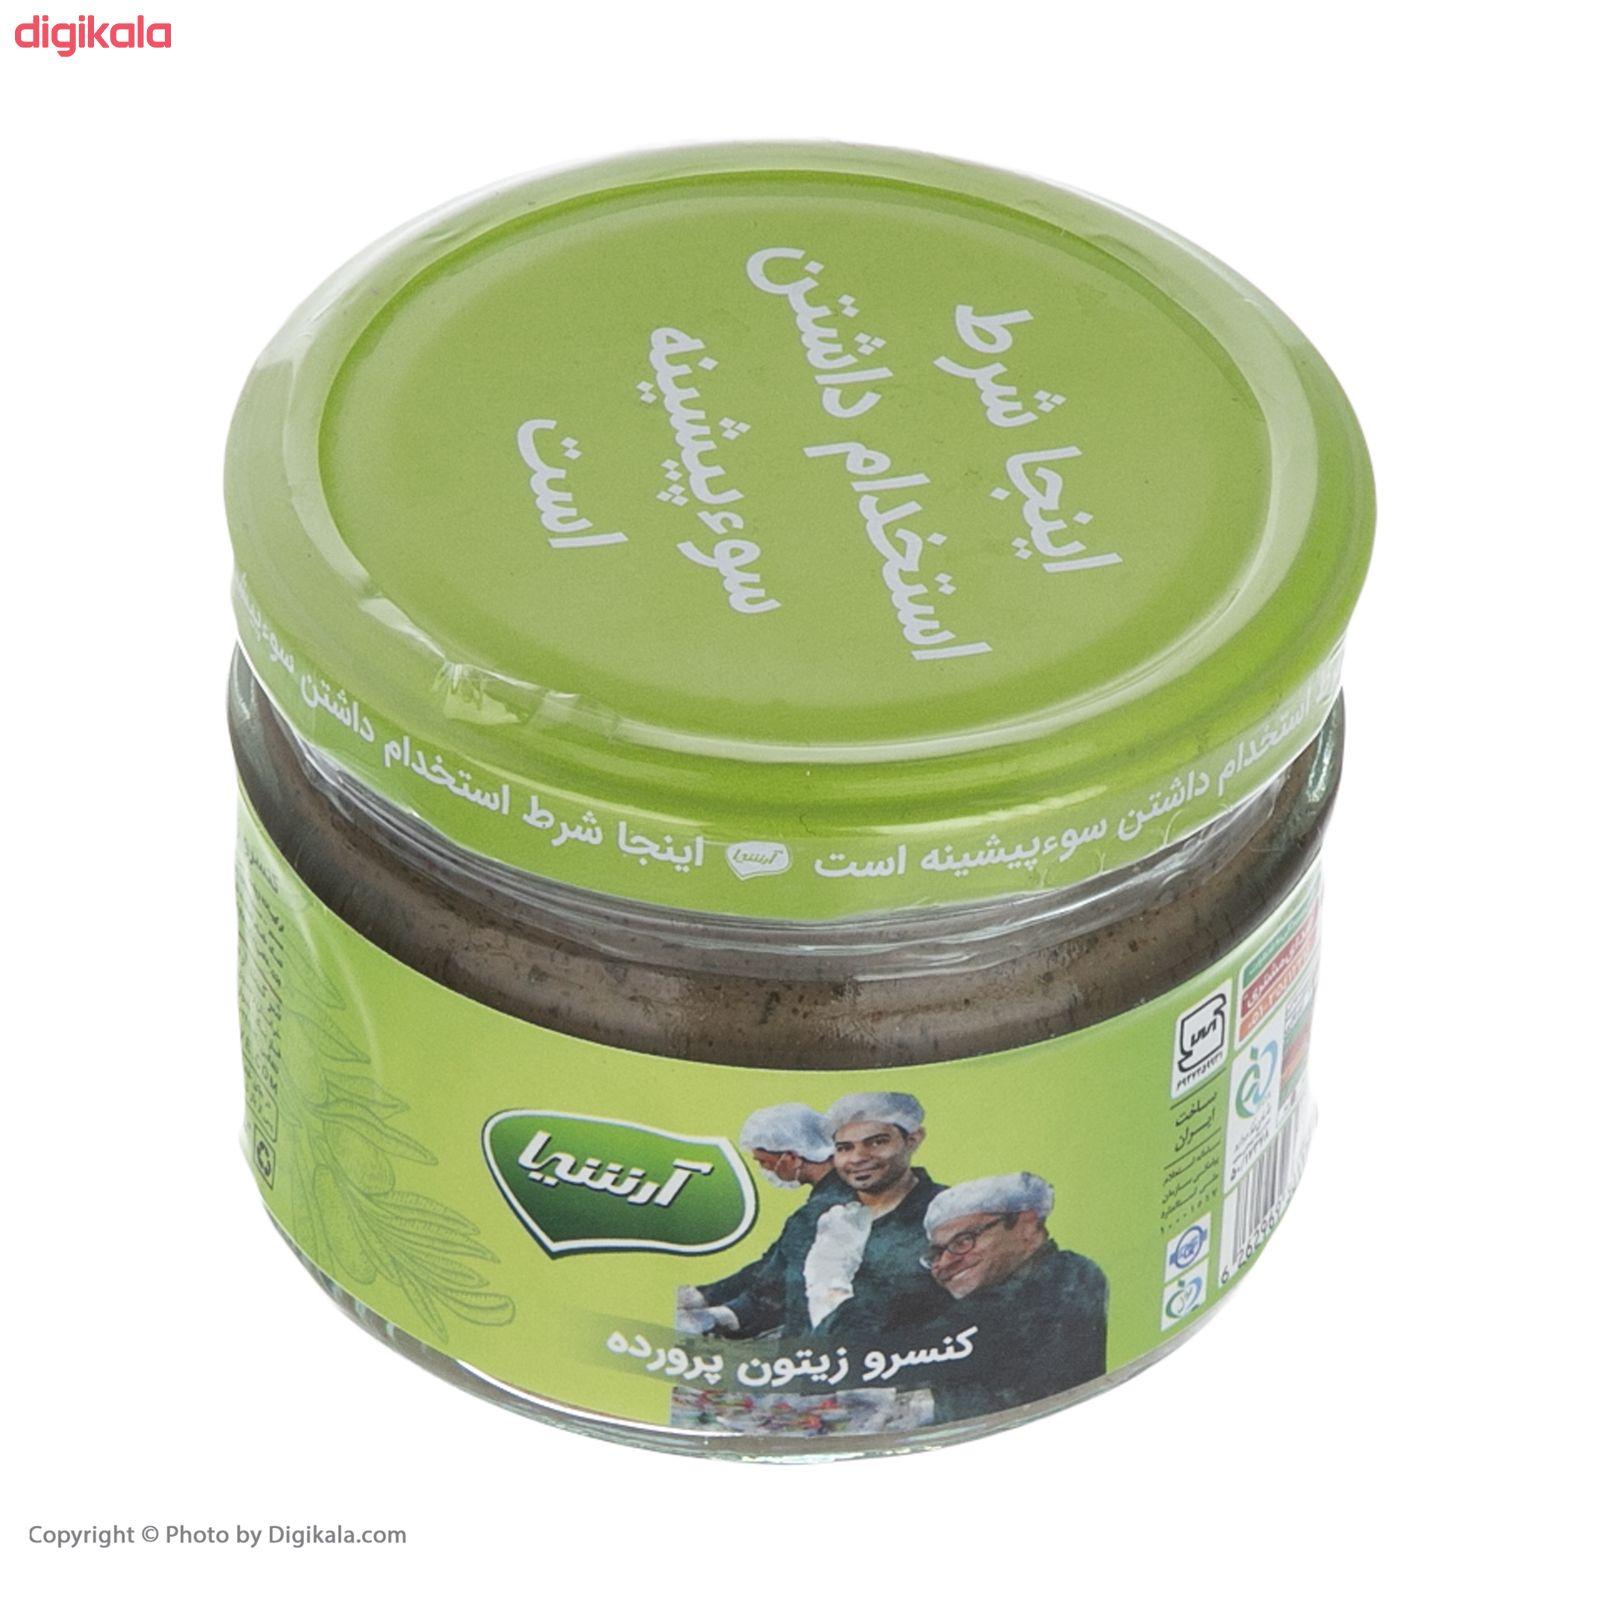 زیتون پرورده آرشیا - 250 گرم main 1 3